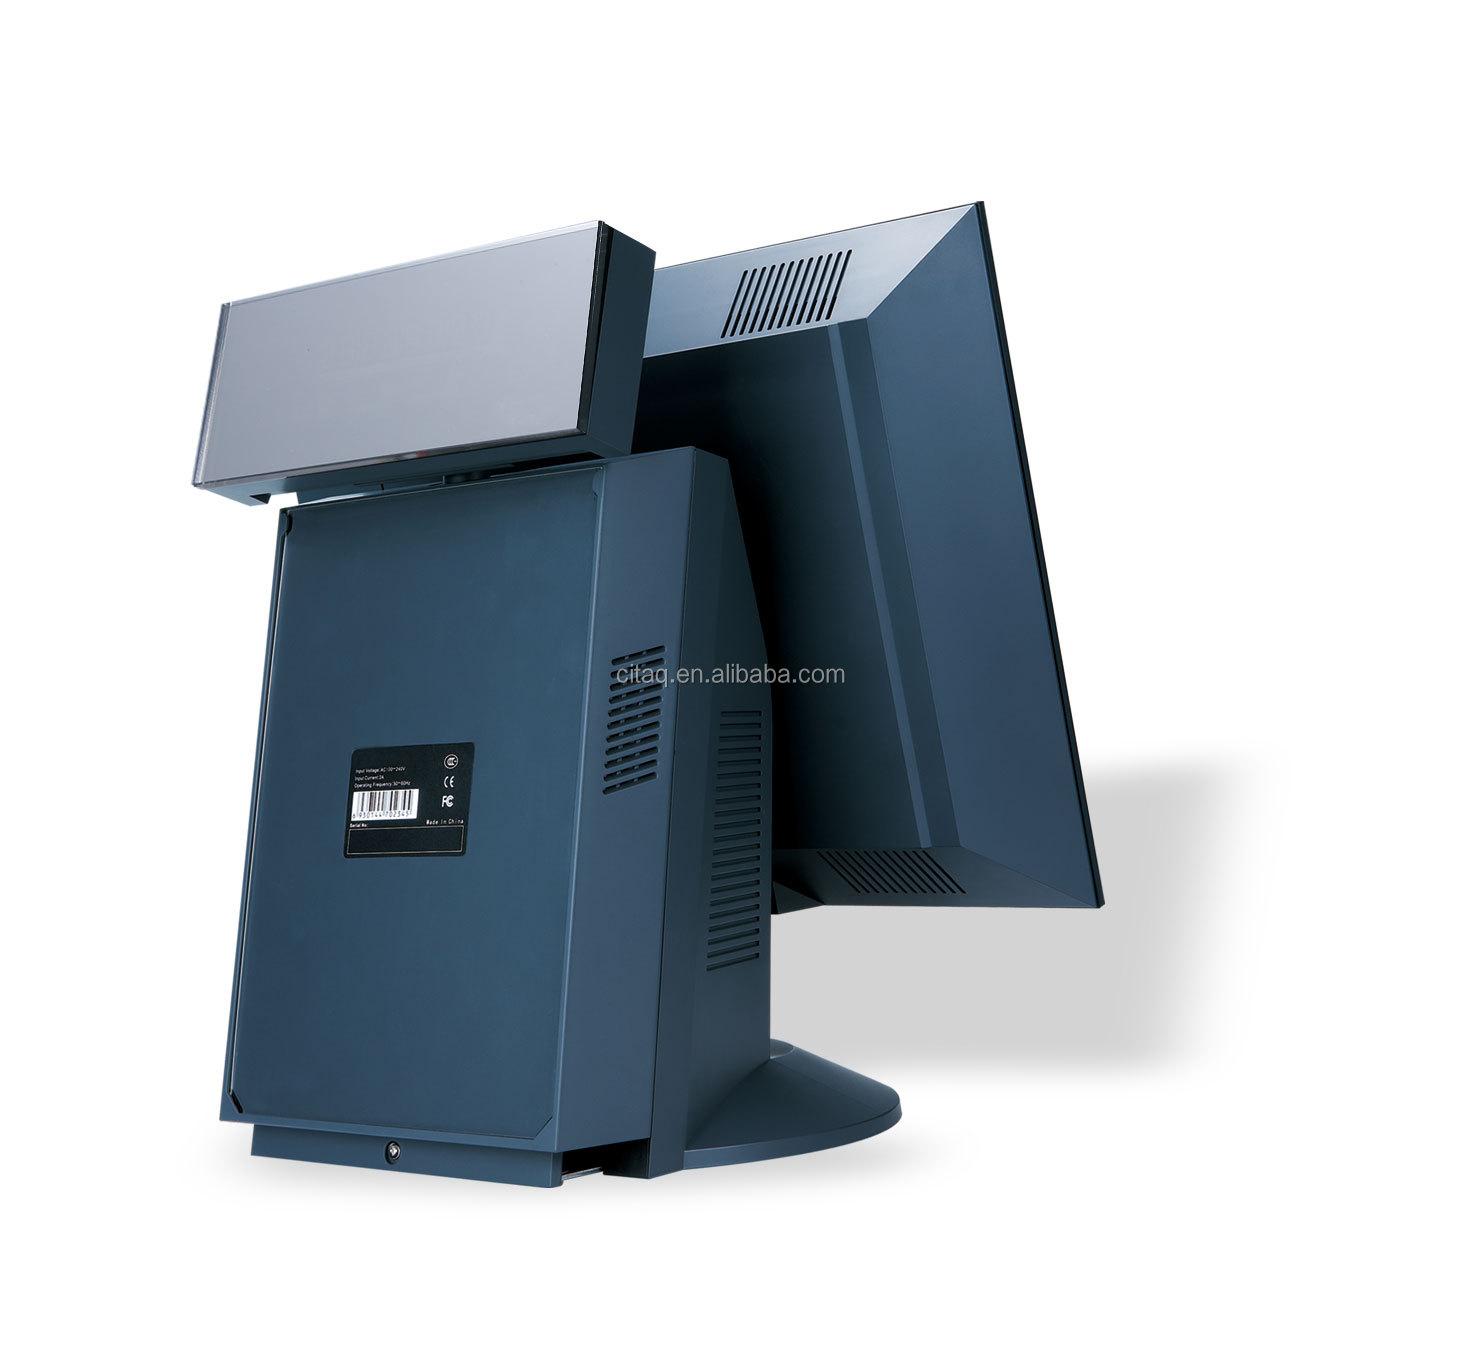 T1 - CITAQ VFD POS Customer Display.jpg